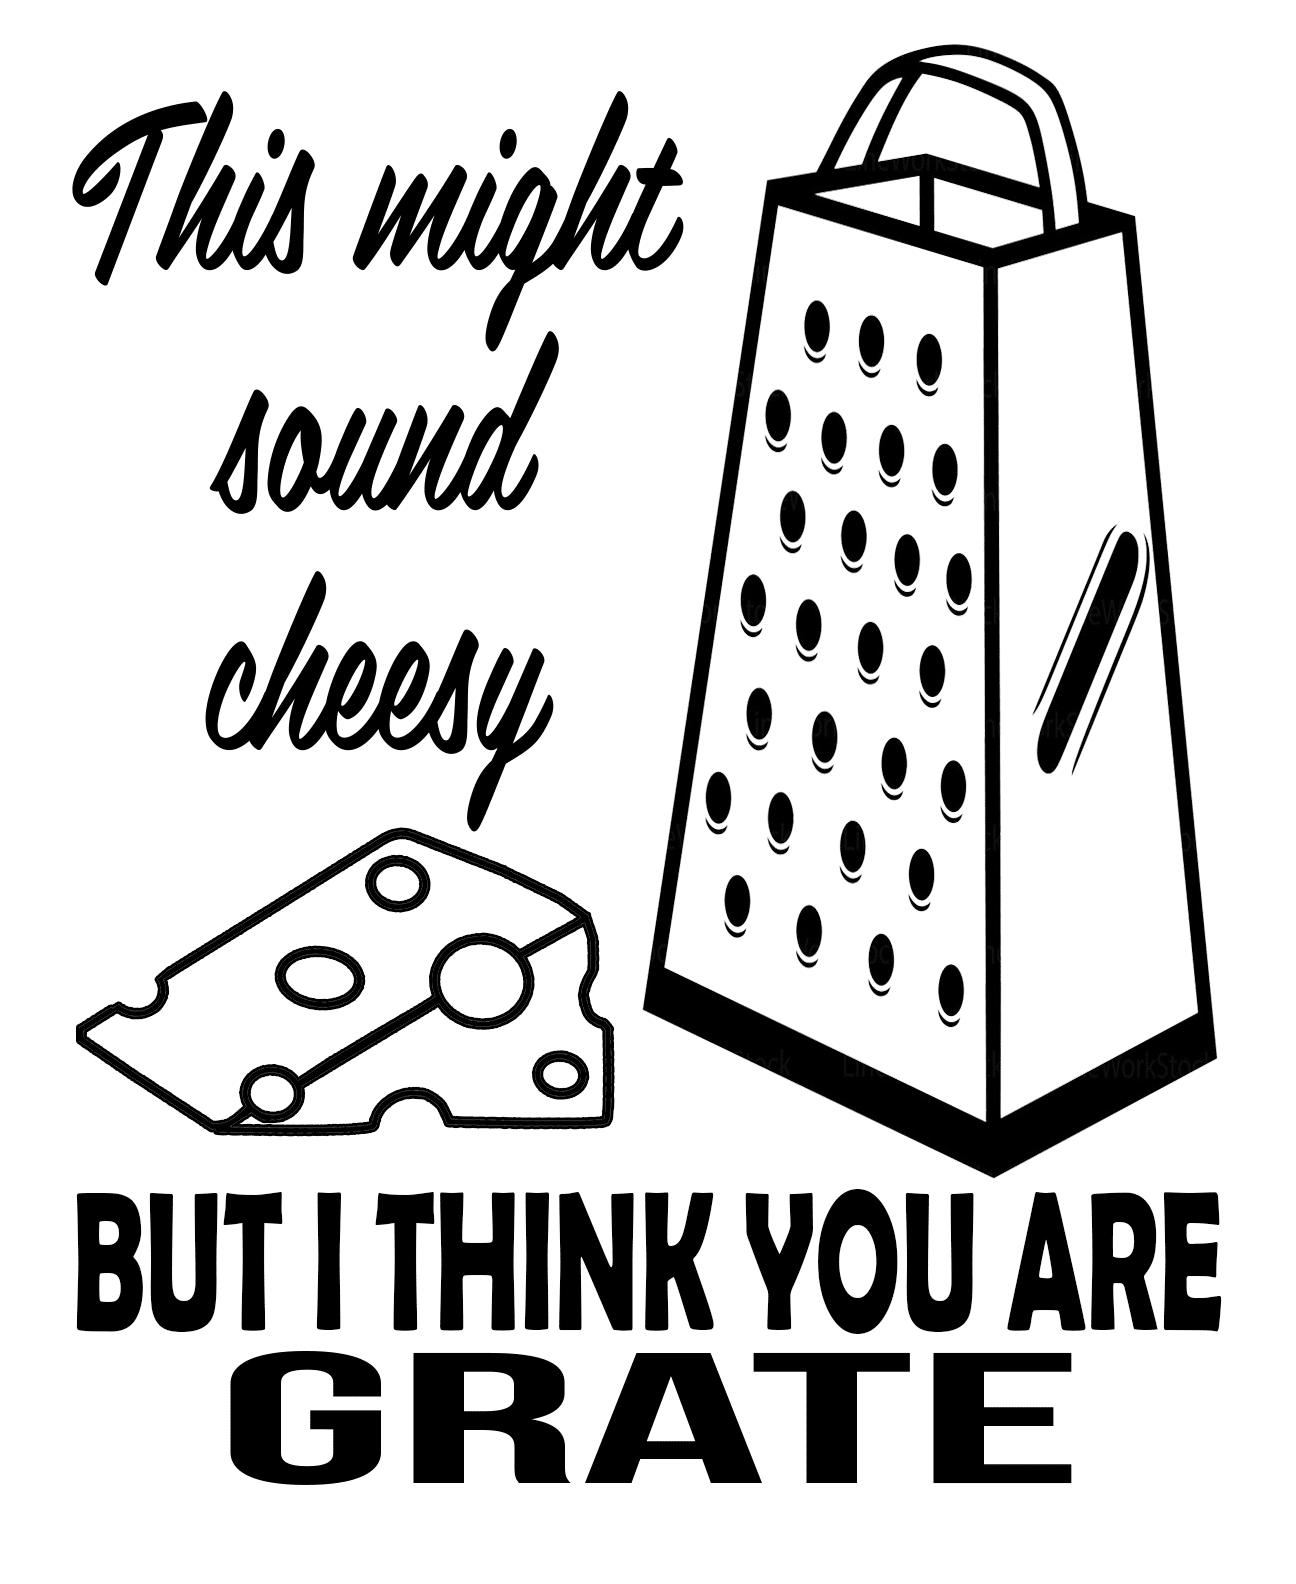 Free Sounds Cheesy SVG File